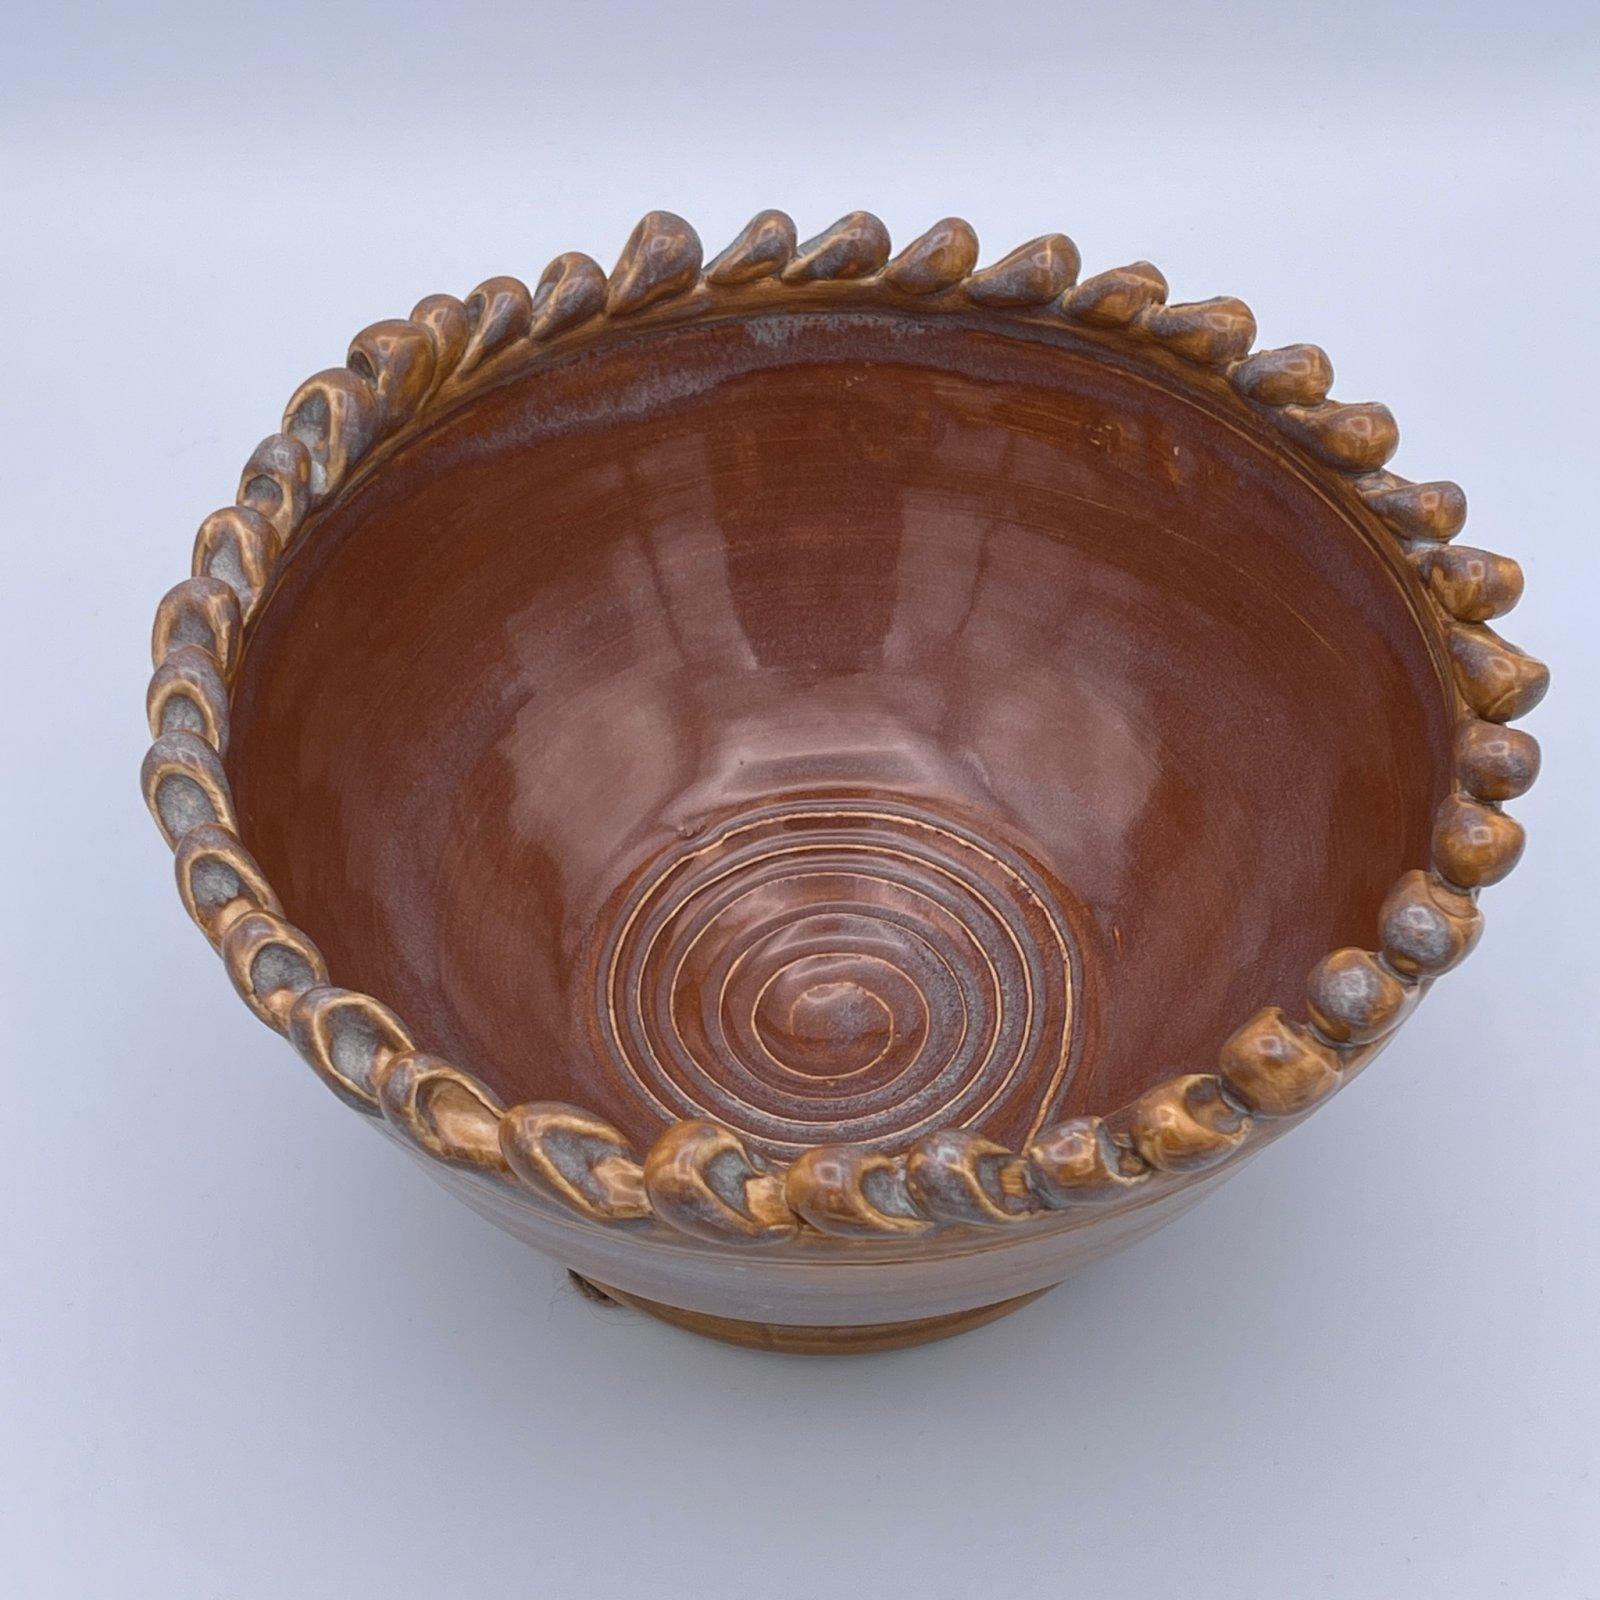 Yarn Pottery - Picot Bowl - Amy Fox Designs